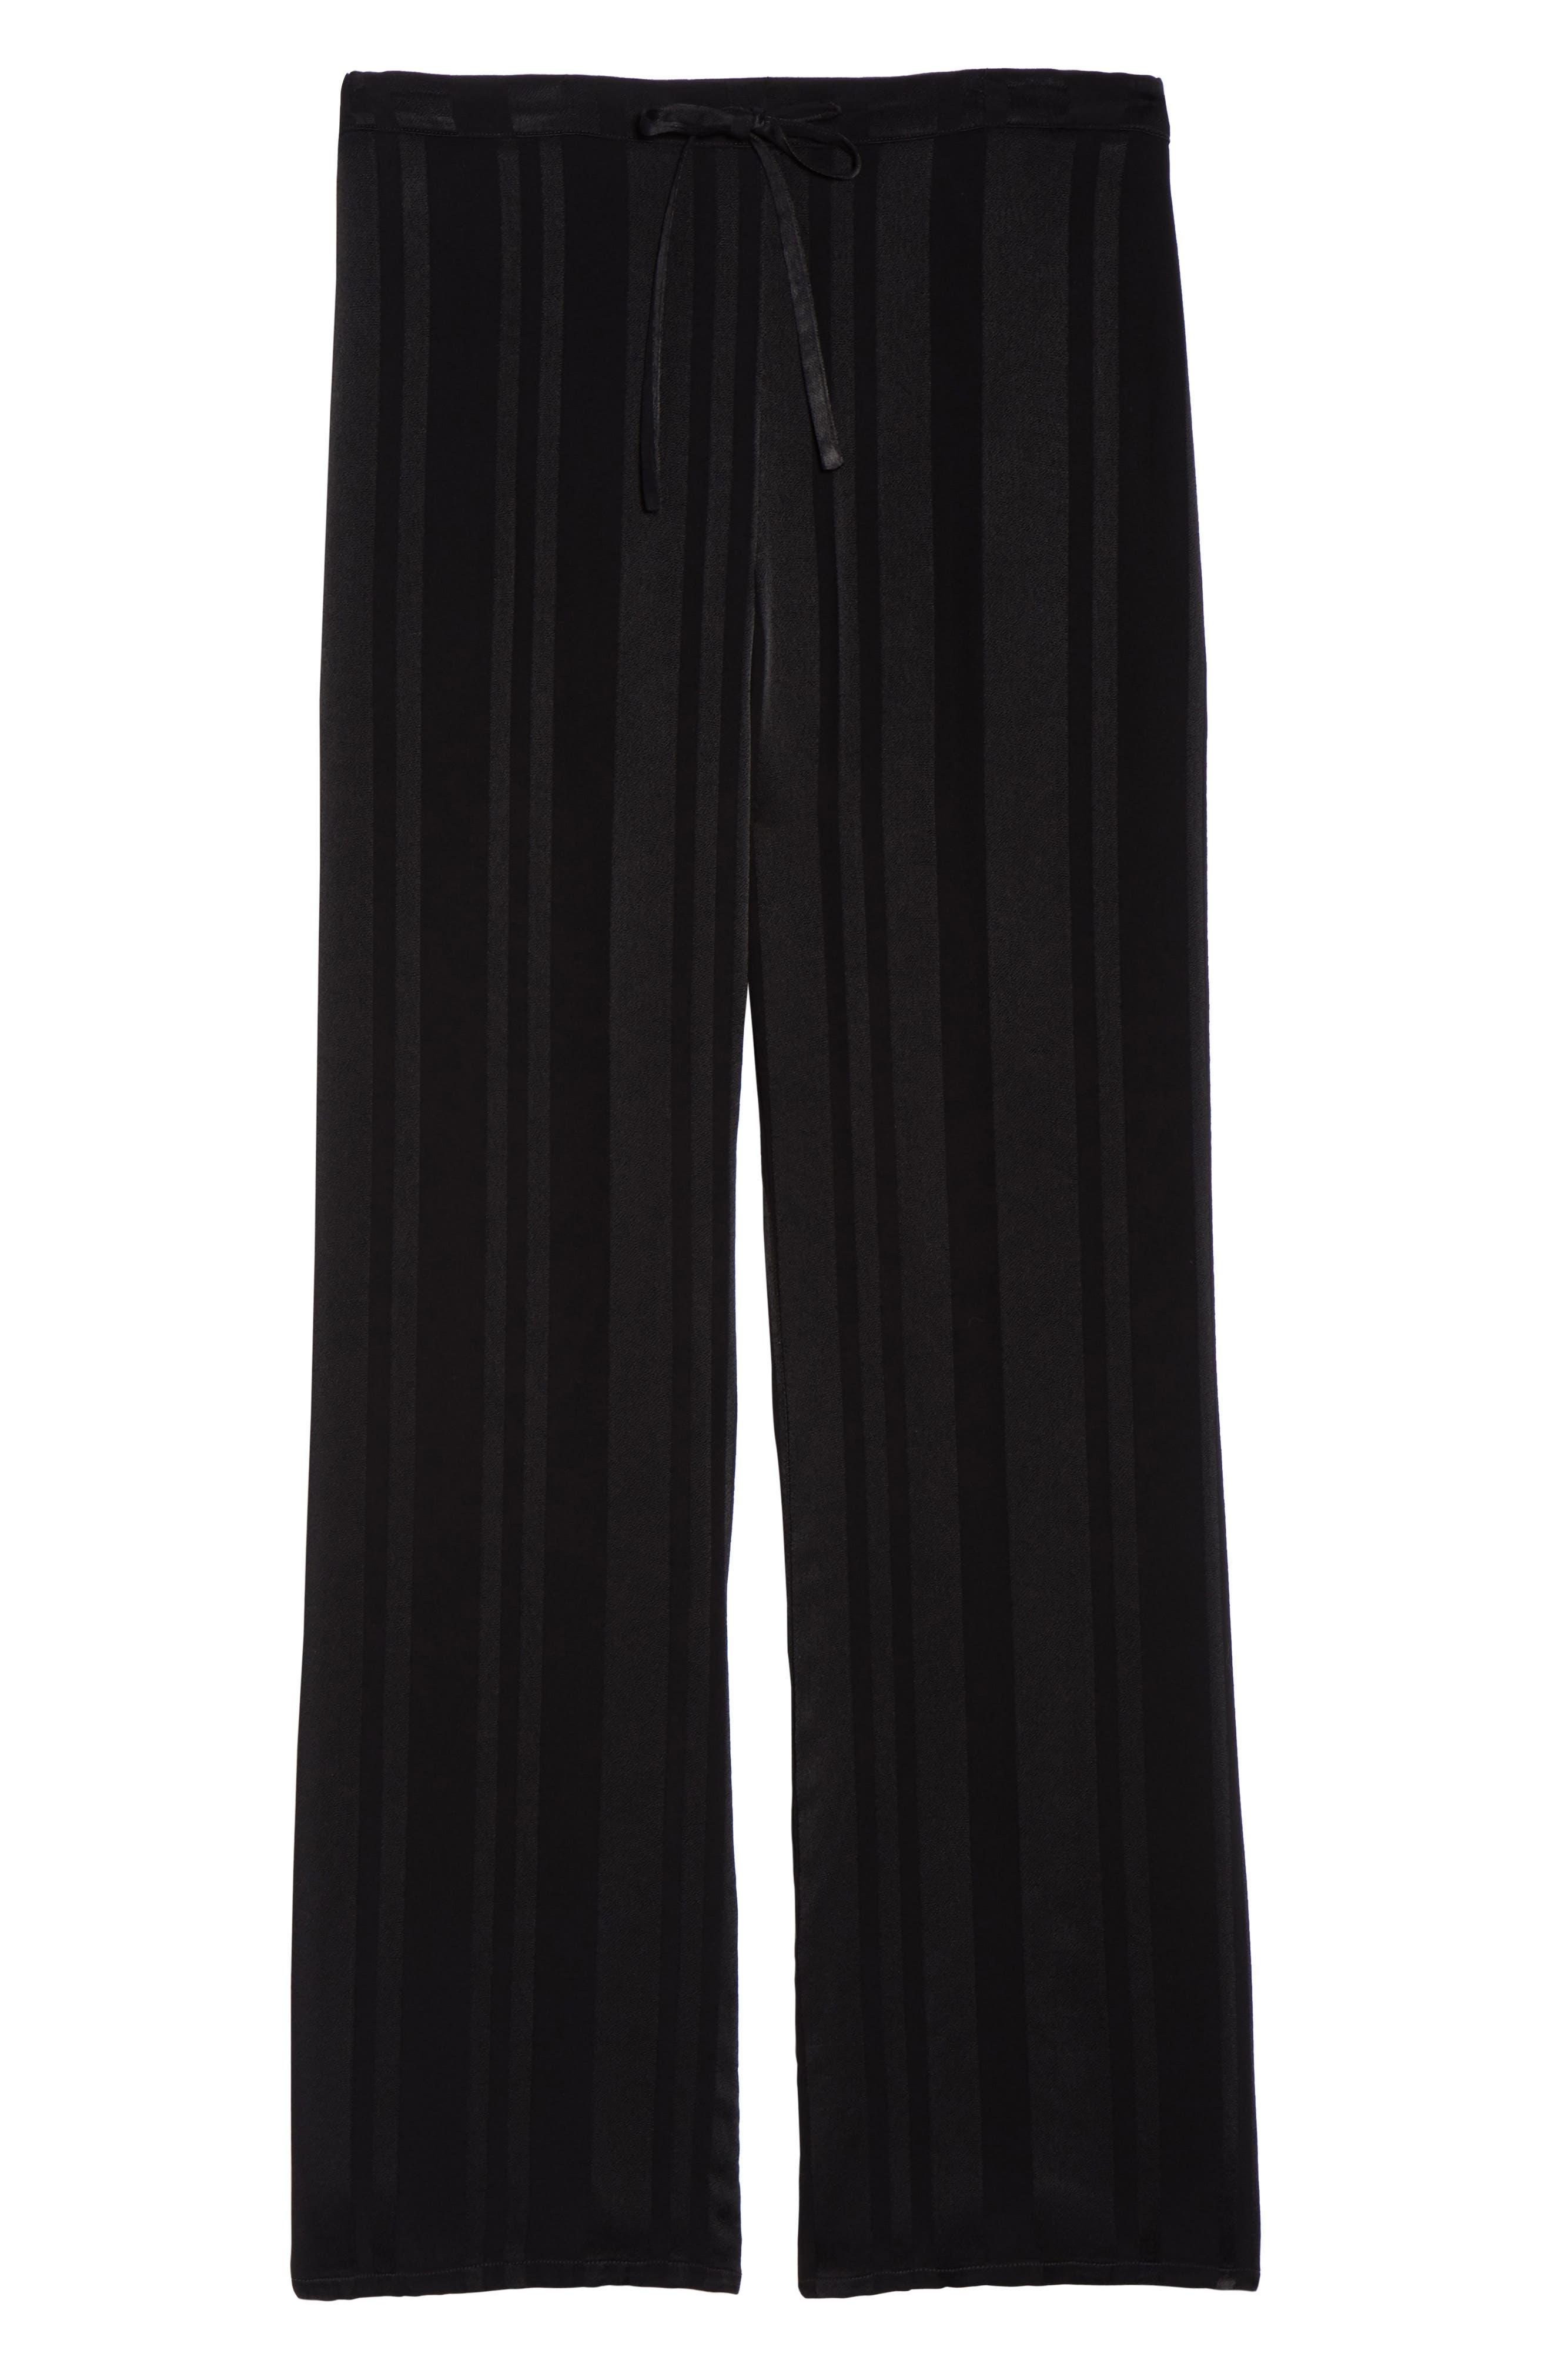 Vela Stripe Lounge Pants,                             Alternate thumbnail 4, color,                             Tar